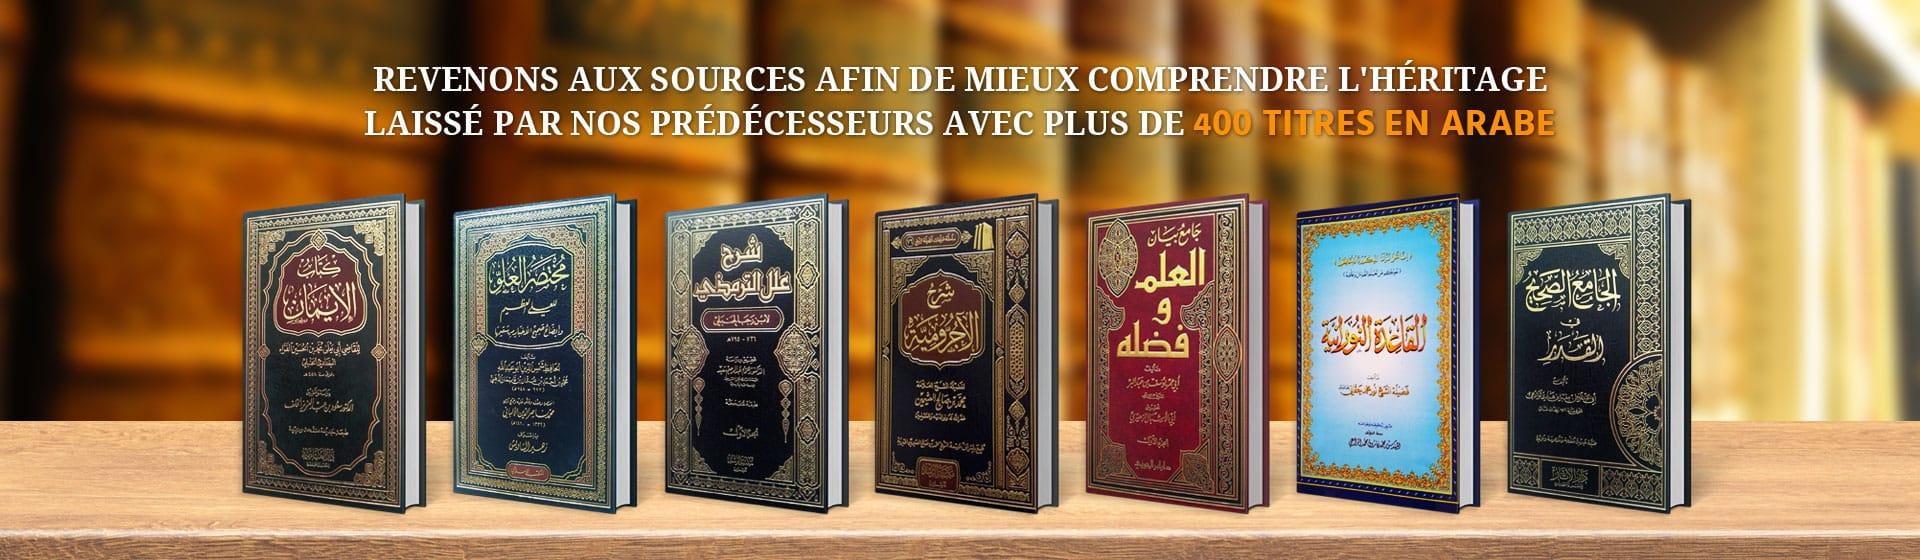 Zoom sur la librairie islamique salaf salih